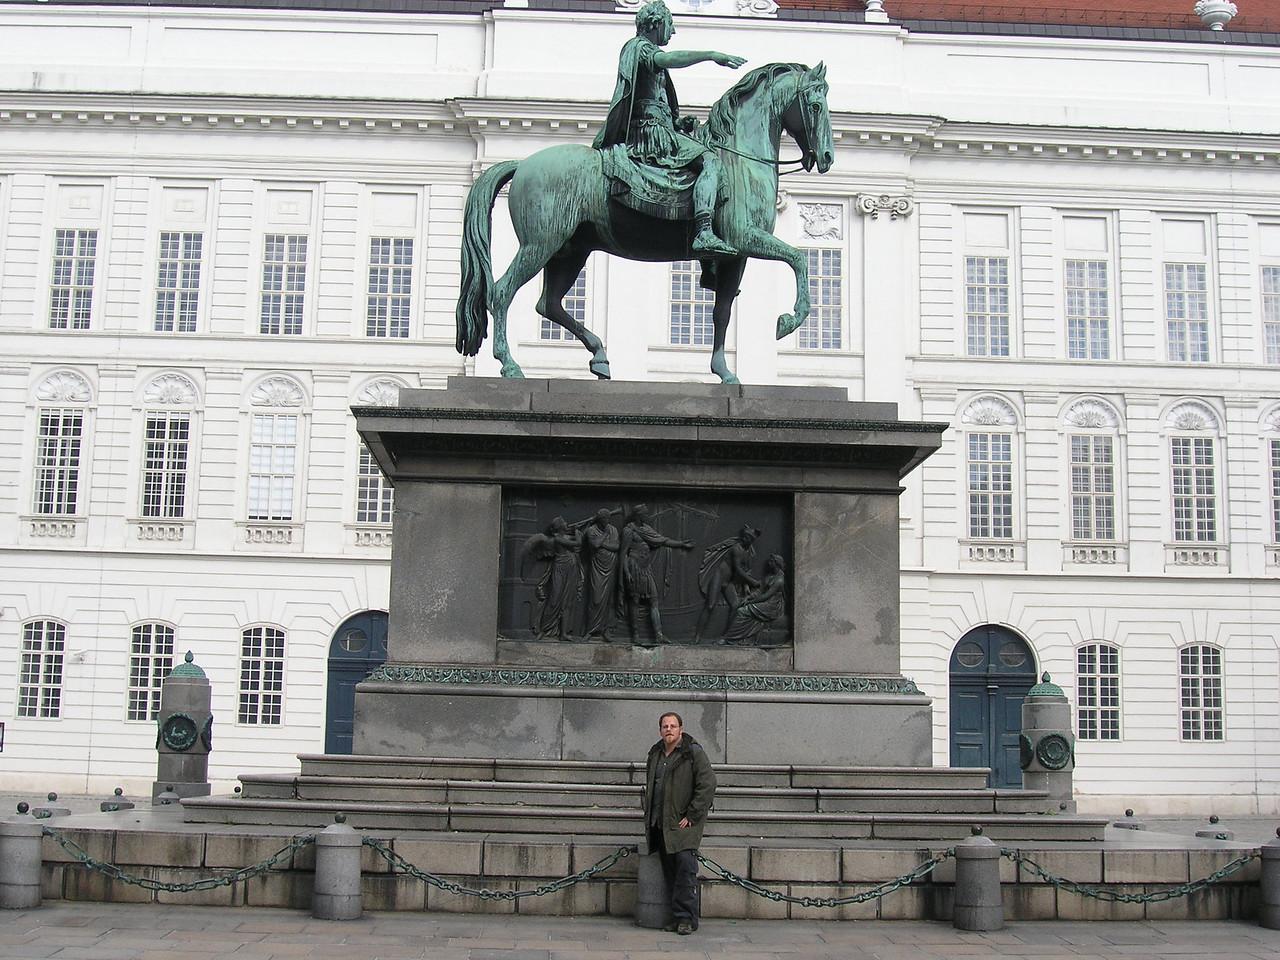 Simon and statue in Vienna